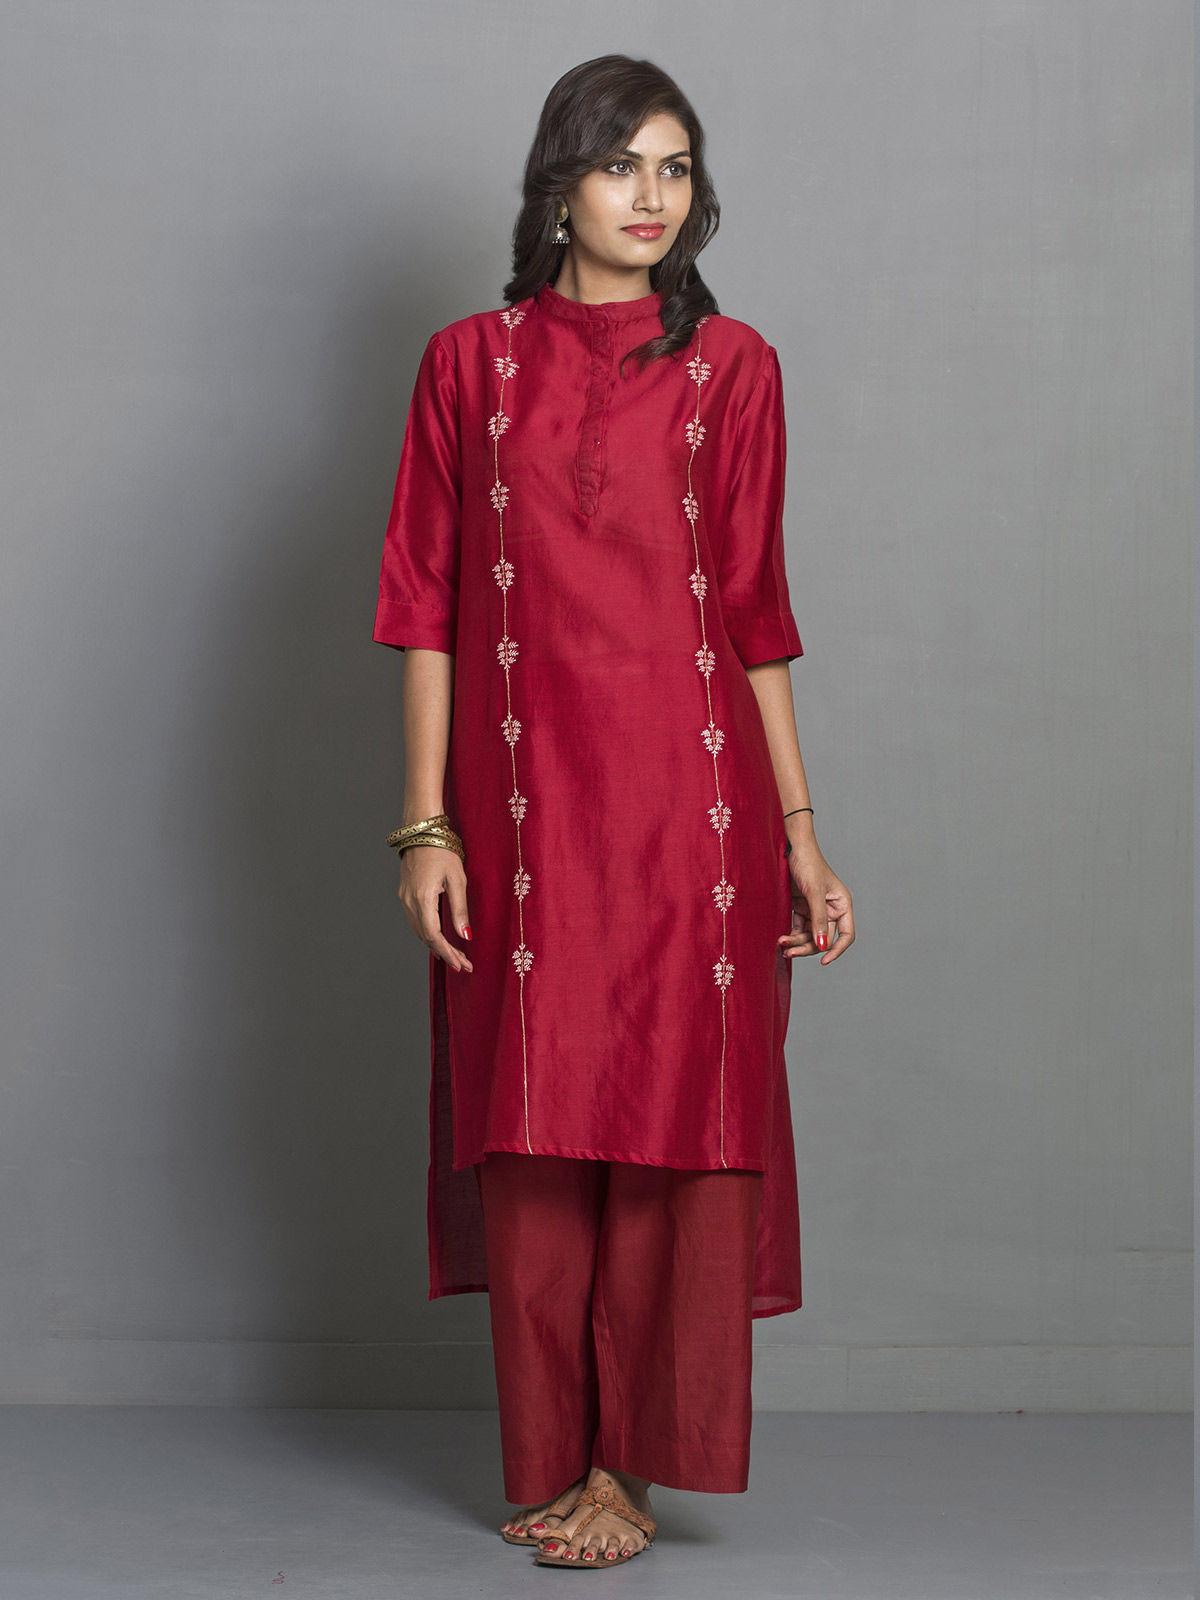 Red Straight Asymmetric Chanderi Kurta with Embroidered Motifs